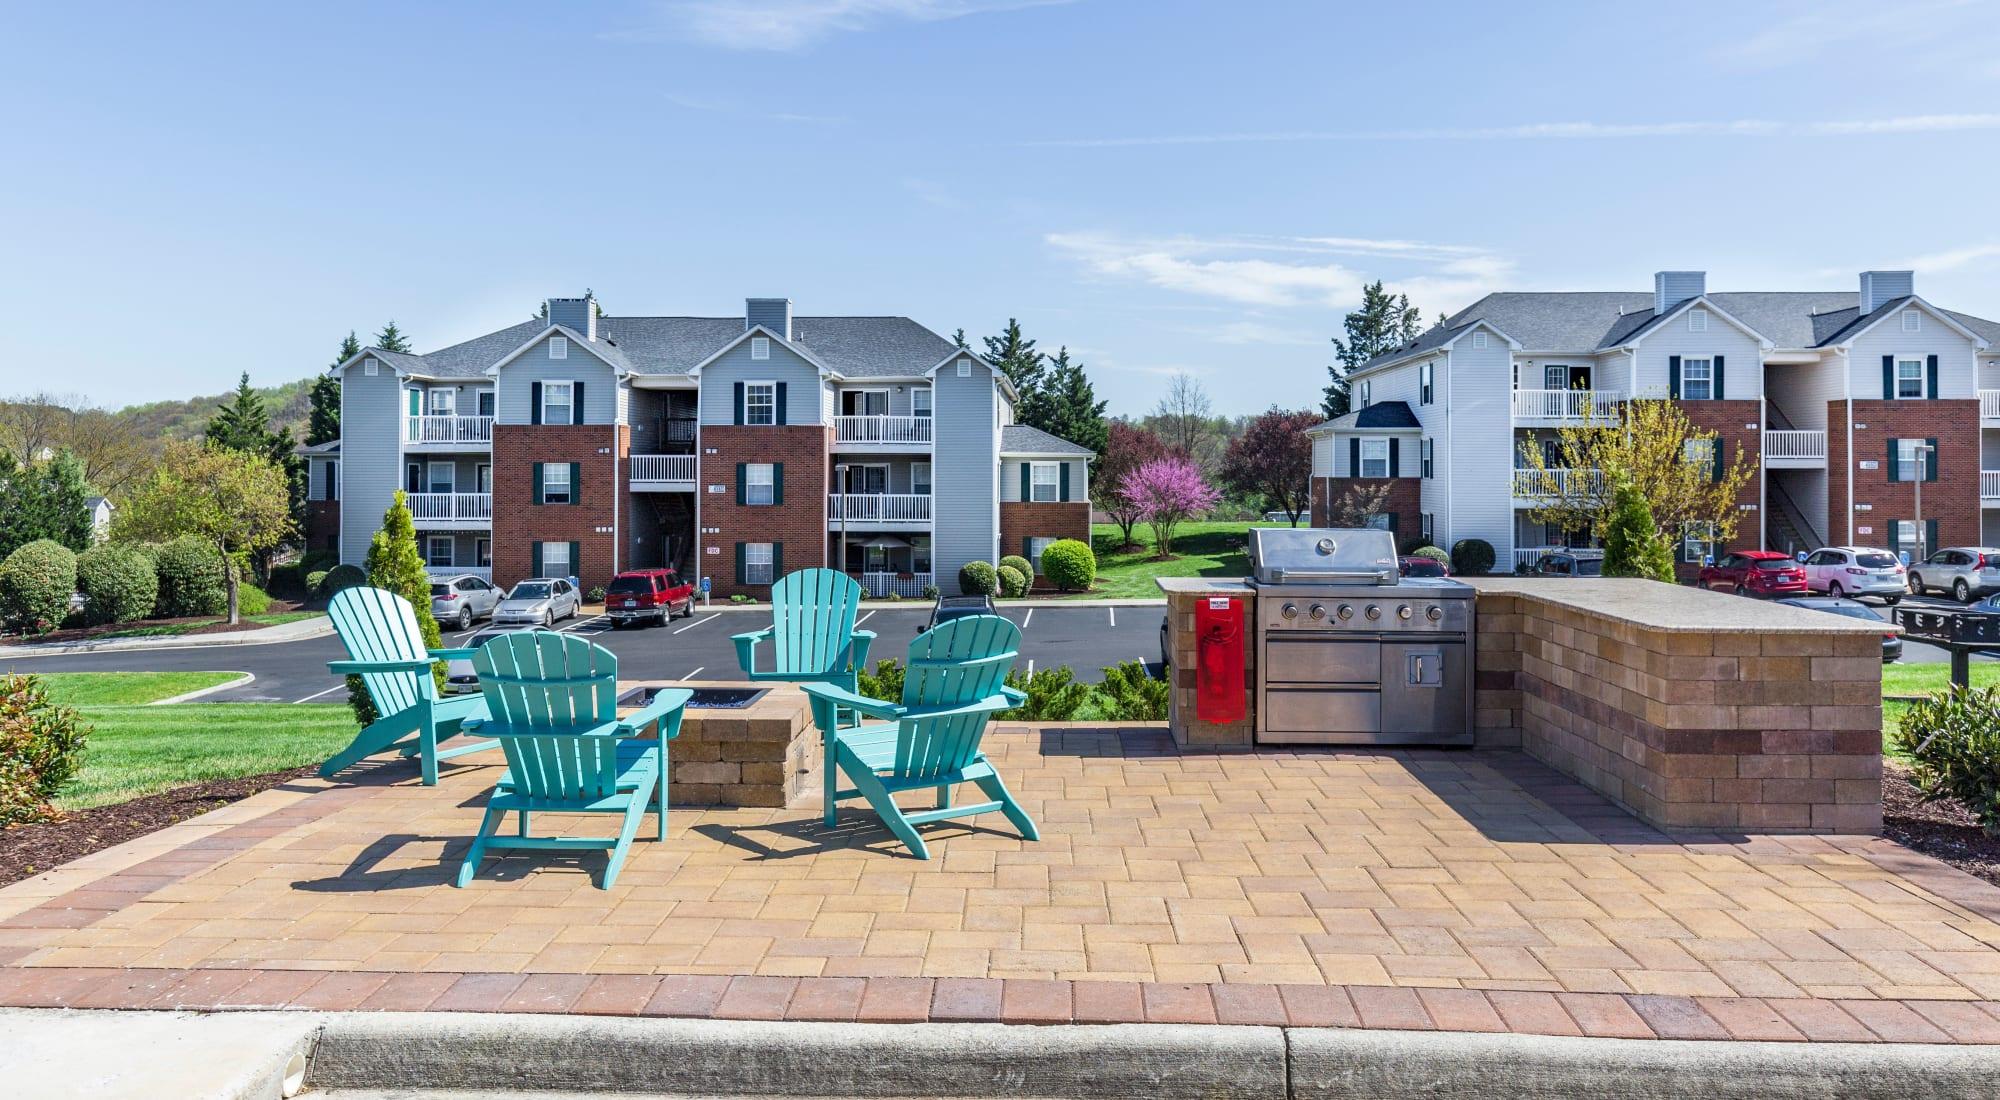 Apartments at Glade Creek Apartments in Roanoke, Virginia